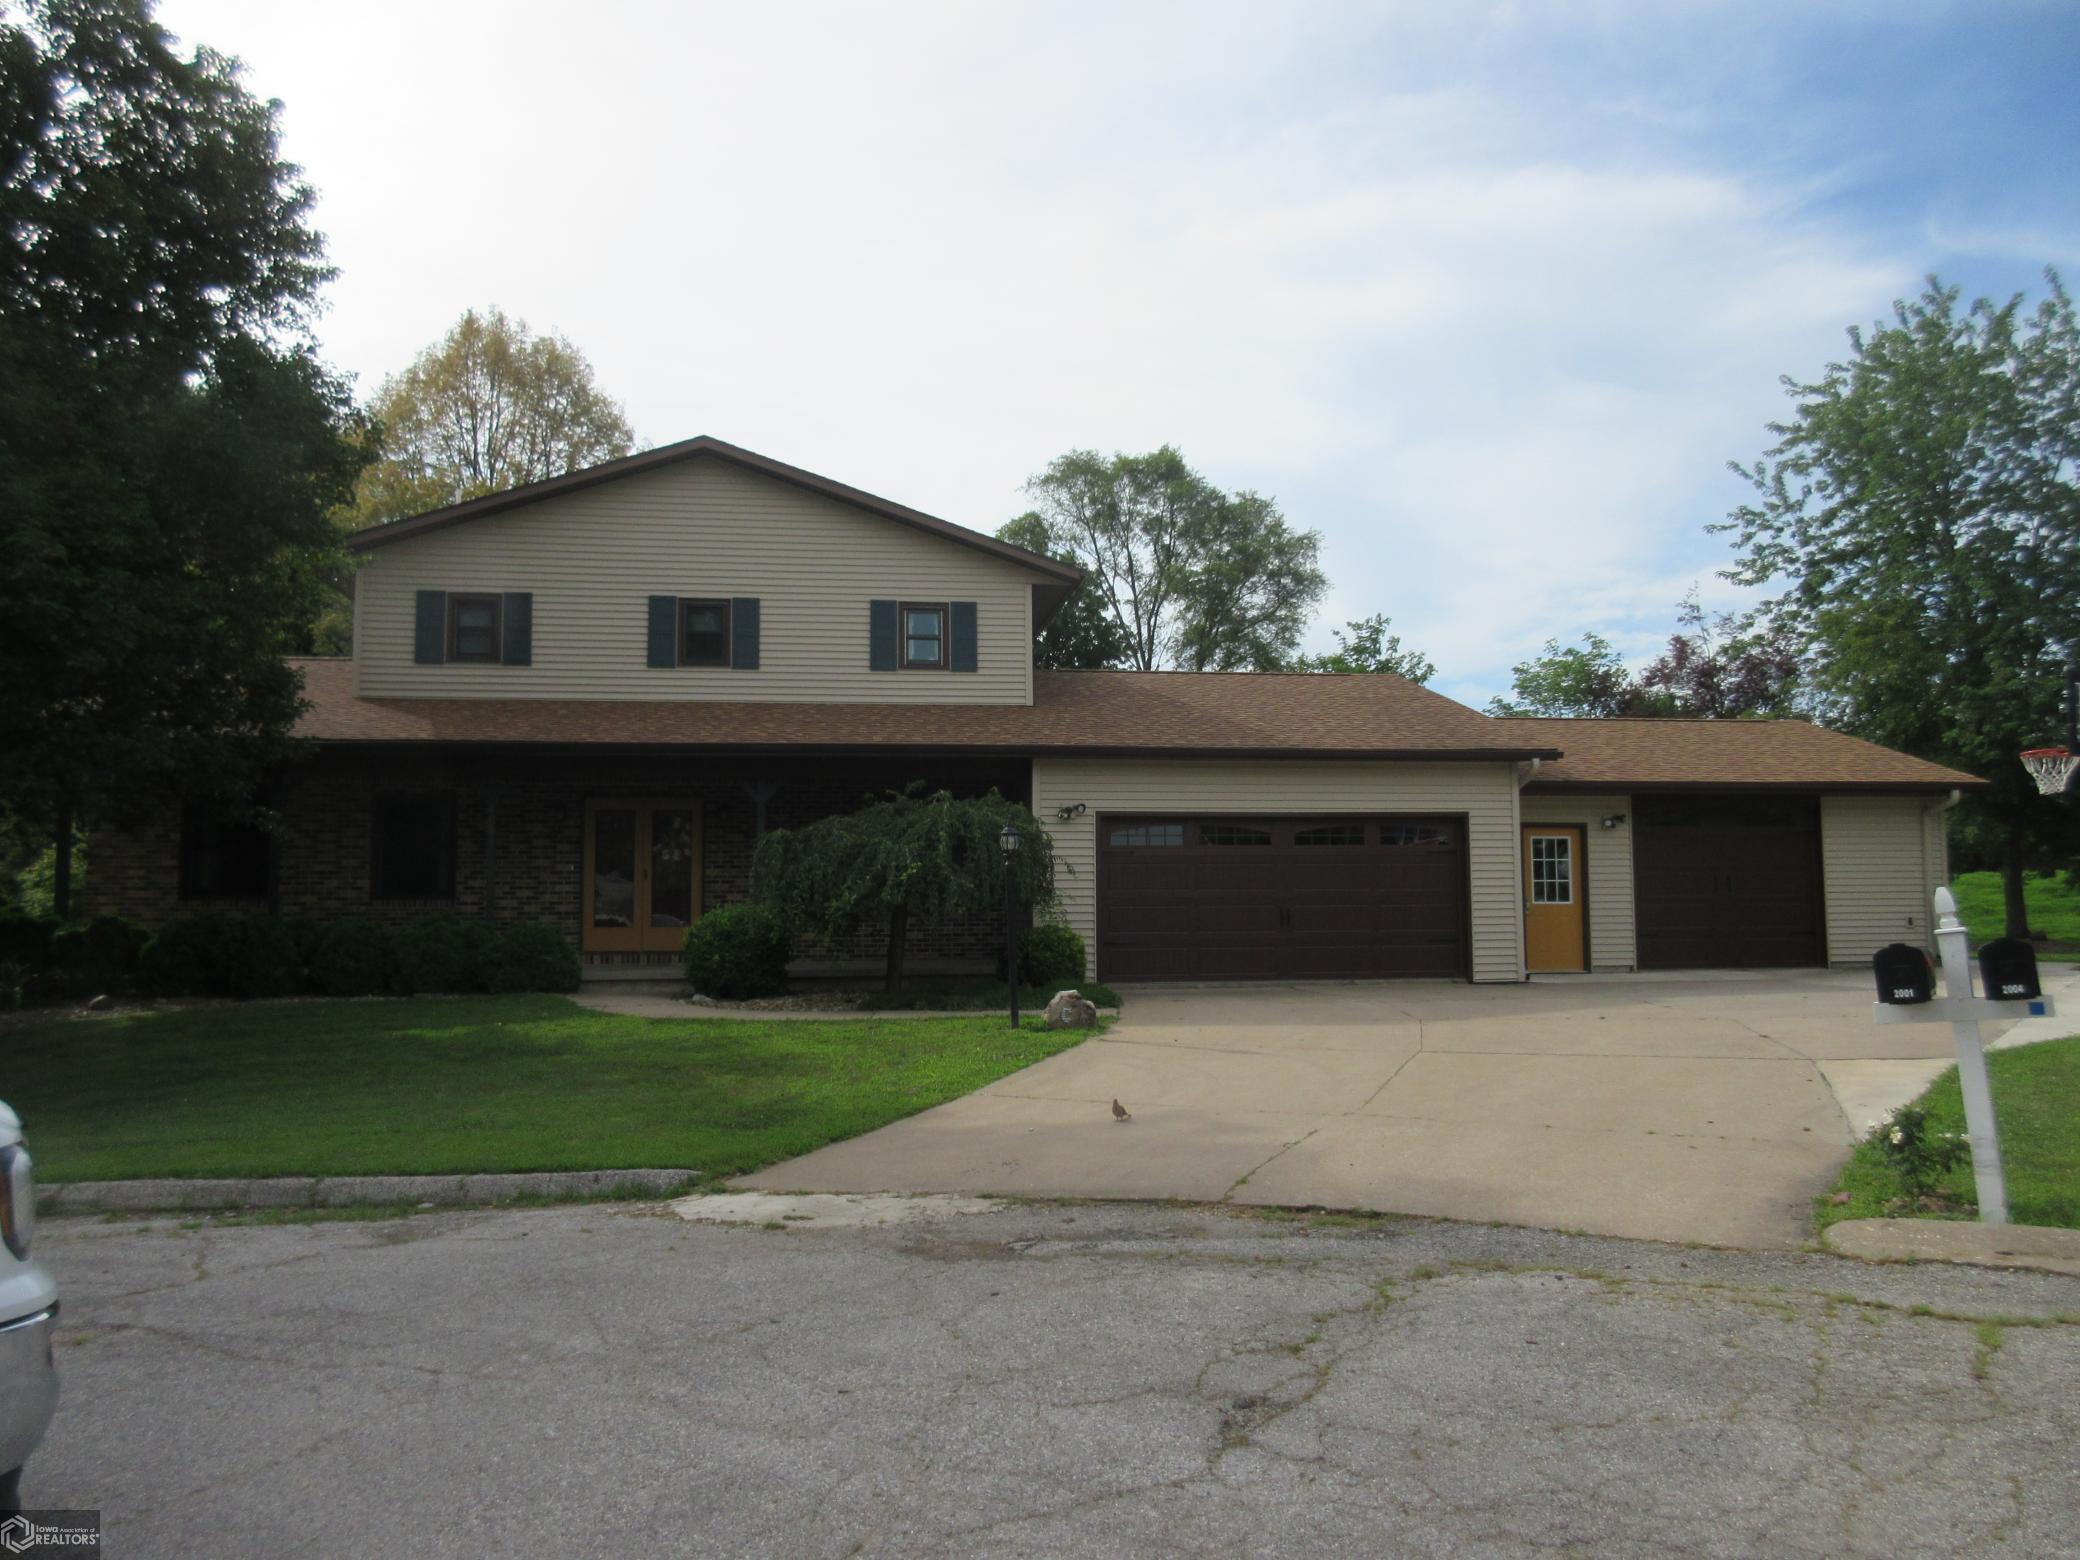 2001 Meadow Property Photo - Keokuk, IA real estate listing